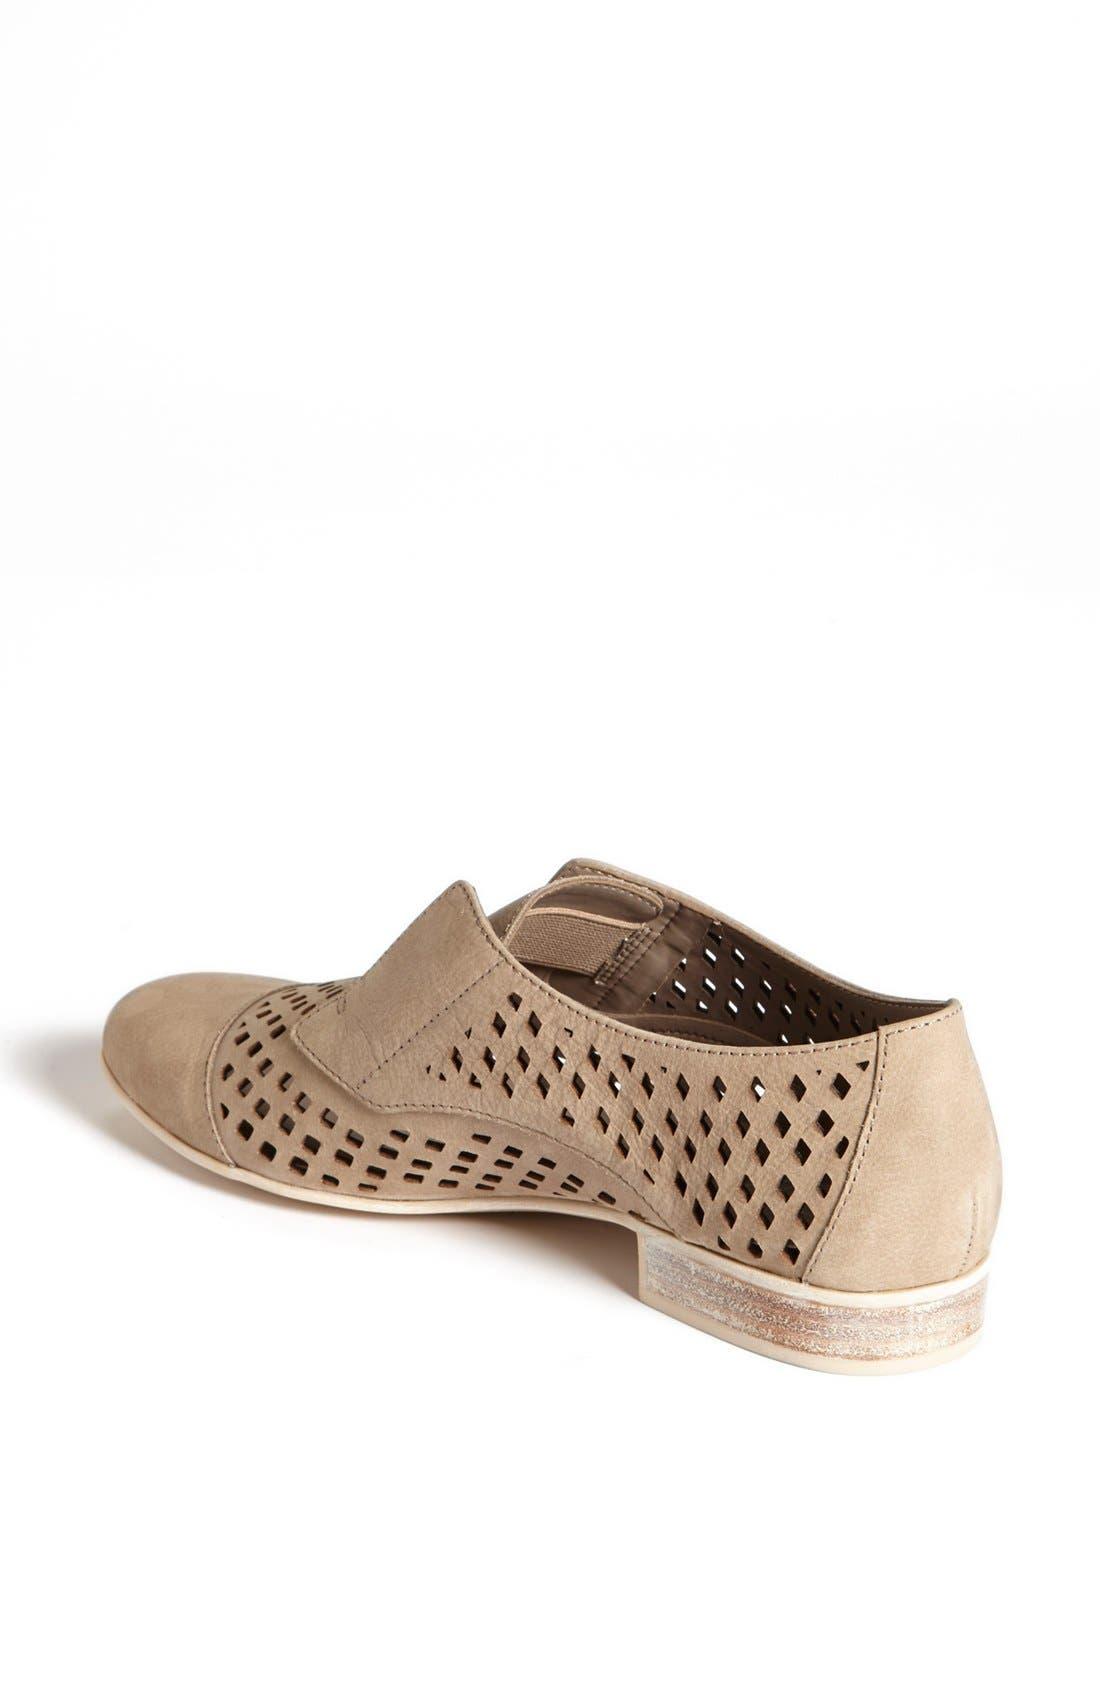 Alternate Image 2  - Franco Sarto 'Amplify' Leather Flat